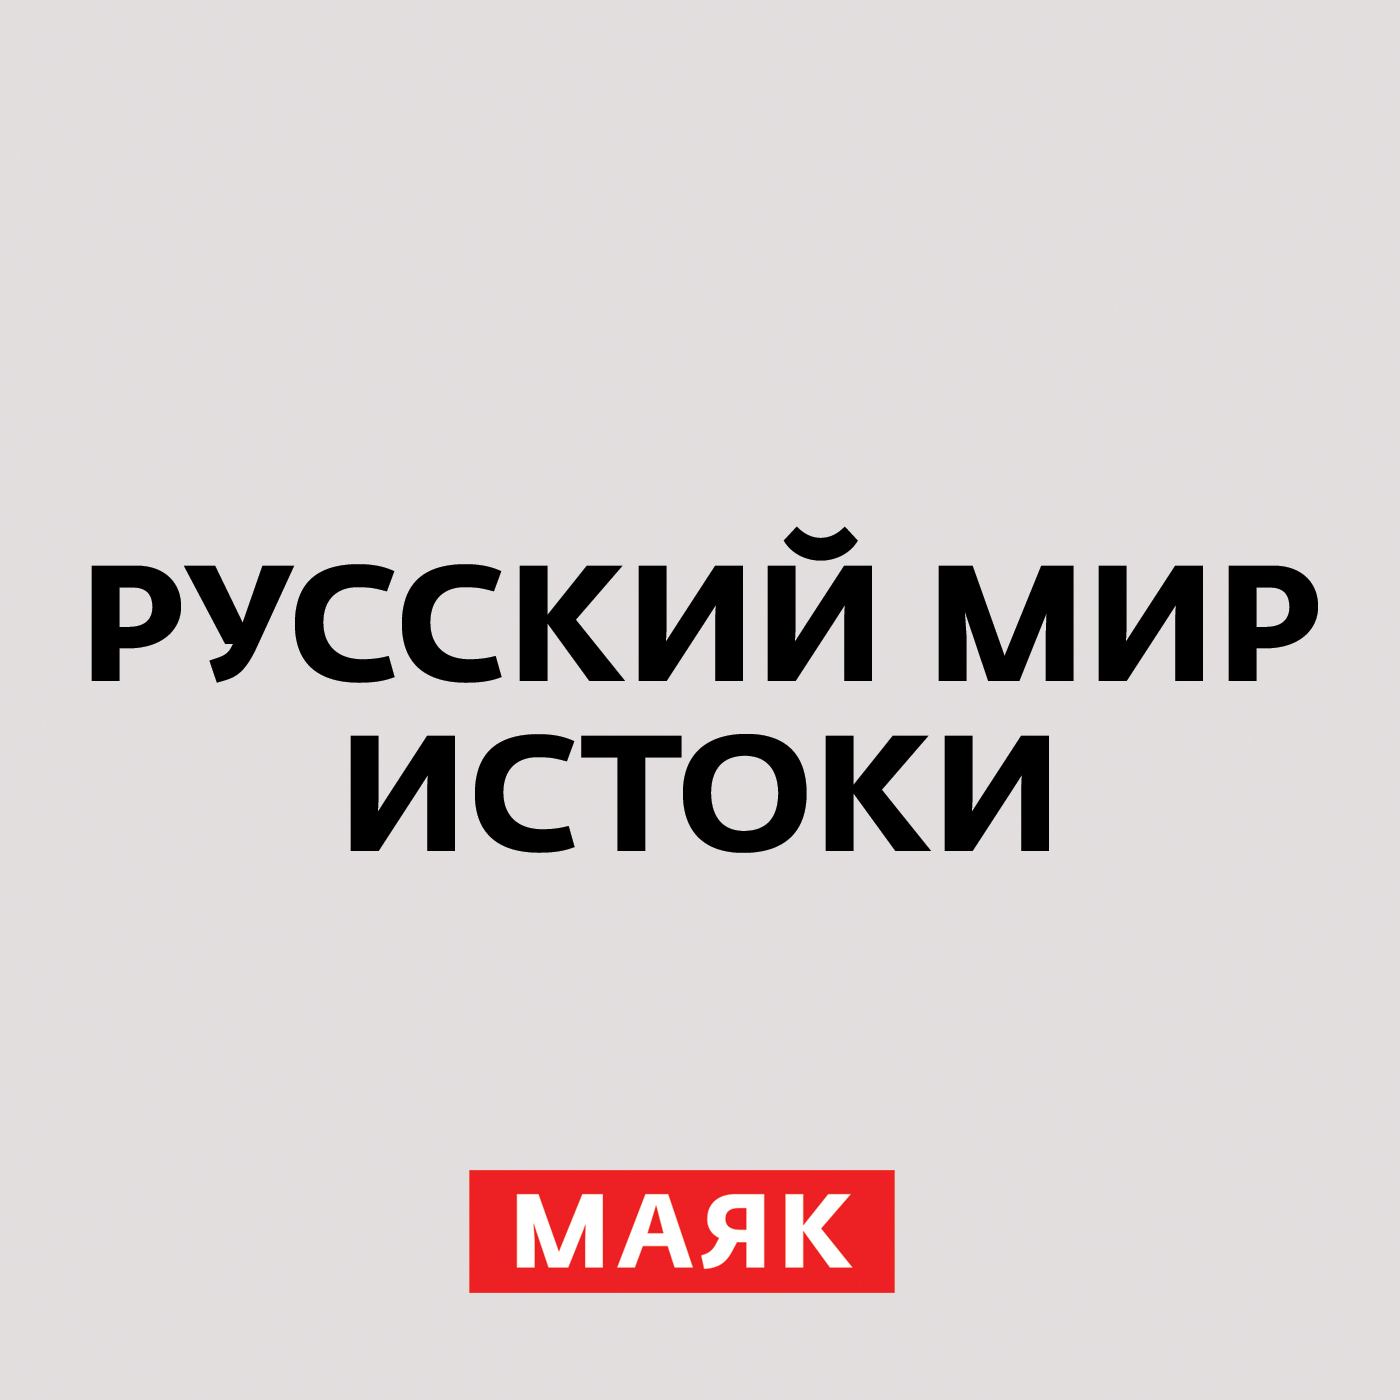 Творческий коллектив радио «Маяк» Екатерина II. Продолжение (часть 4) творческий коллектив радио маяк екатерина ii часть 6